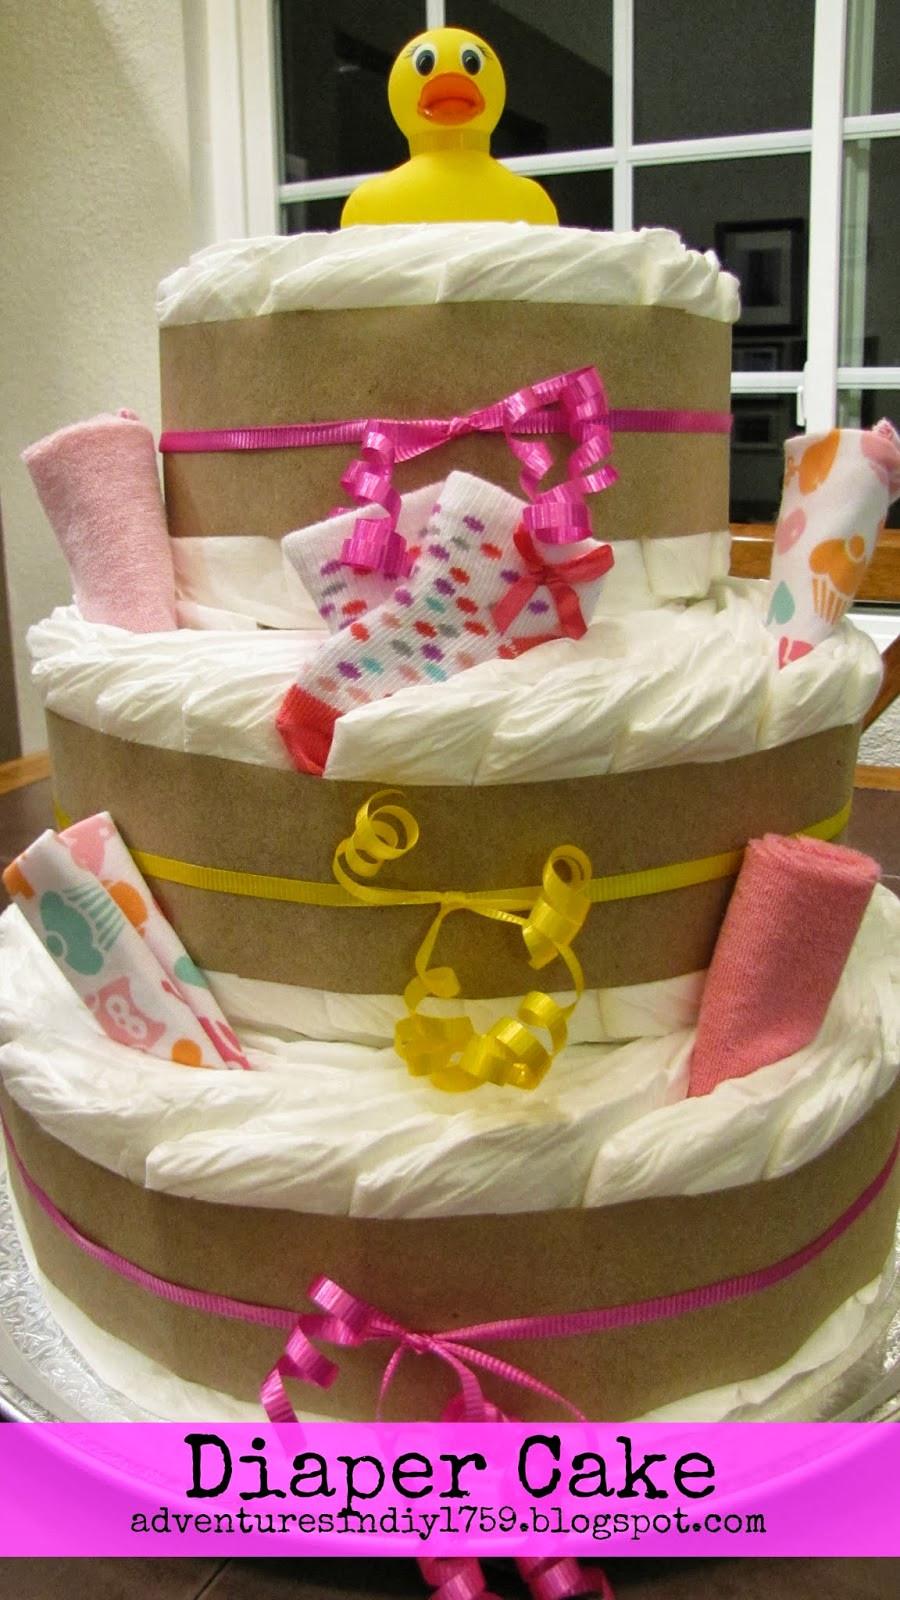 DIY Baby Shower Cakes  Adventures in DIY Baby Shower Diaper Cake